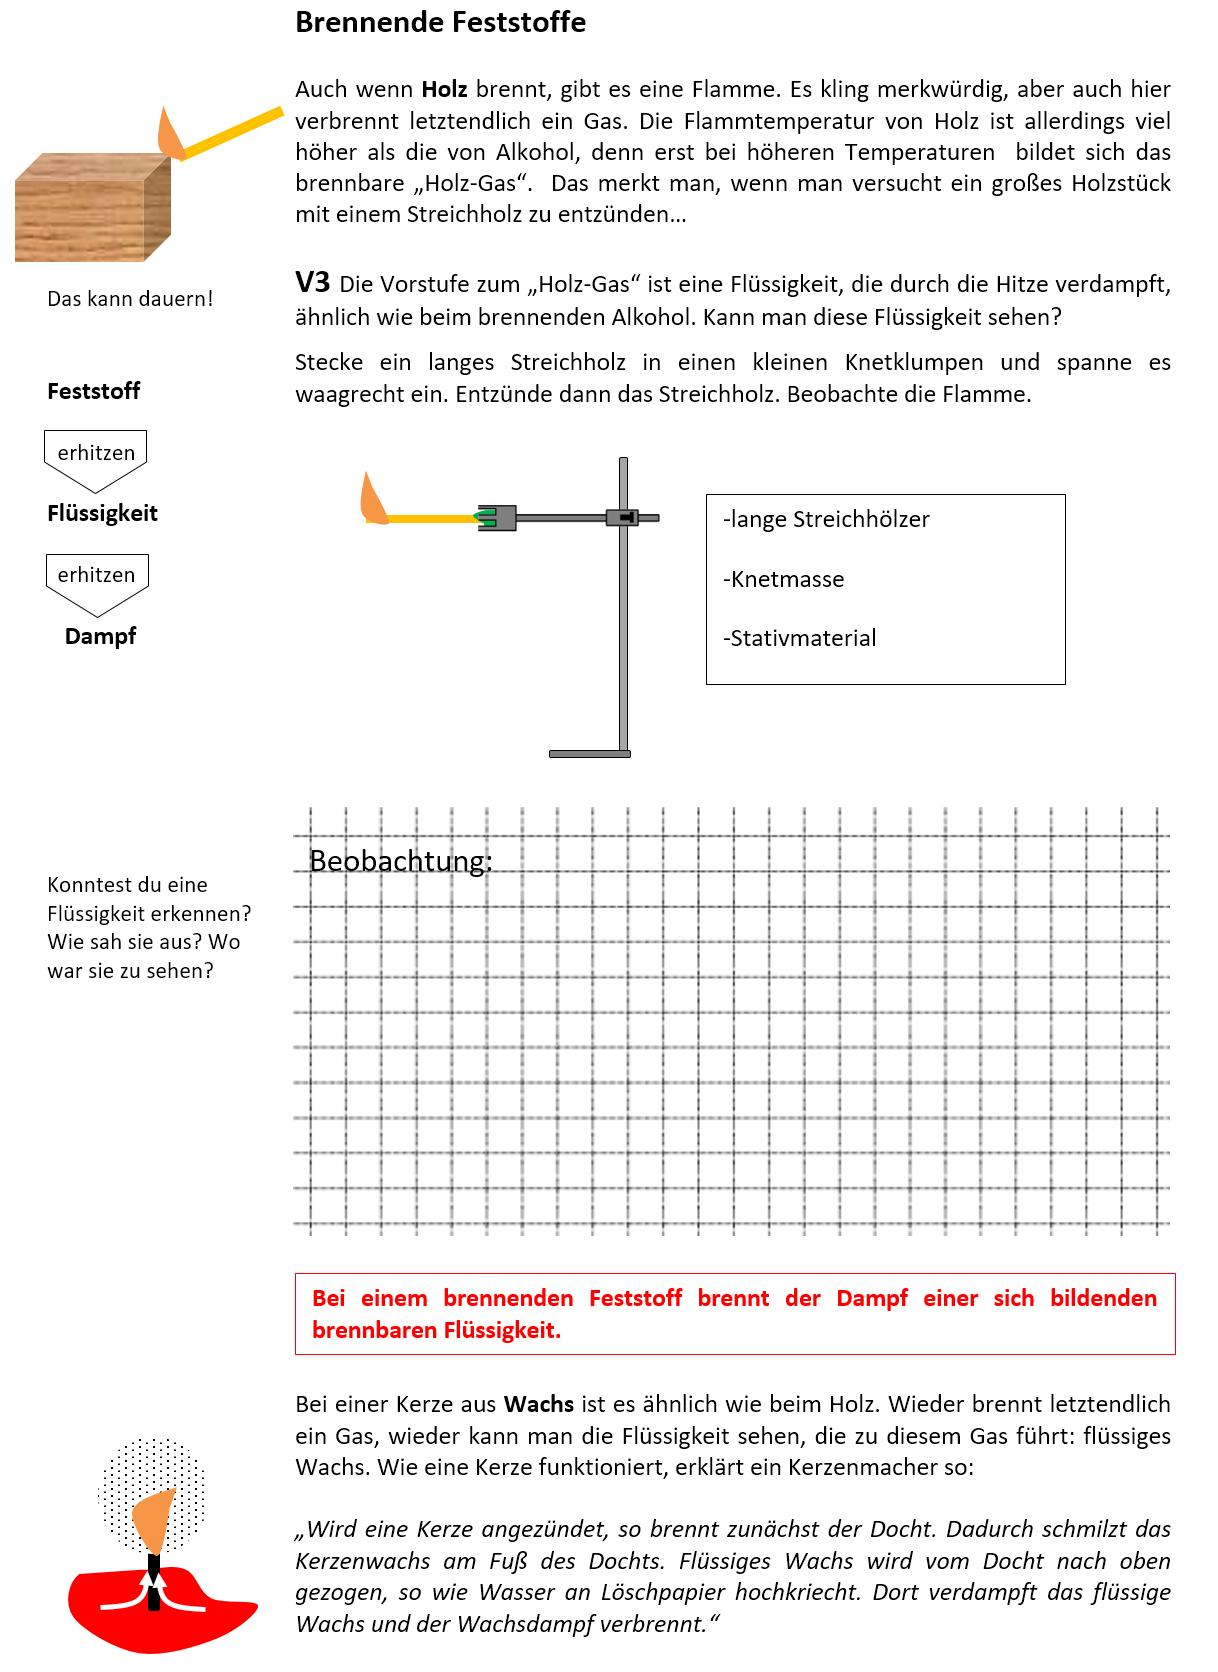 Enchanting Materie Bewertung Arbeitsblatt Collection - Kindergarten ...